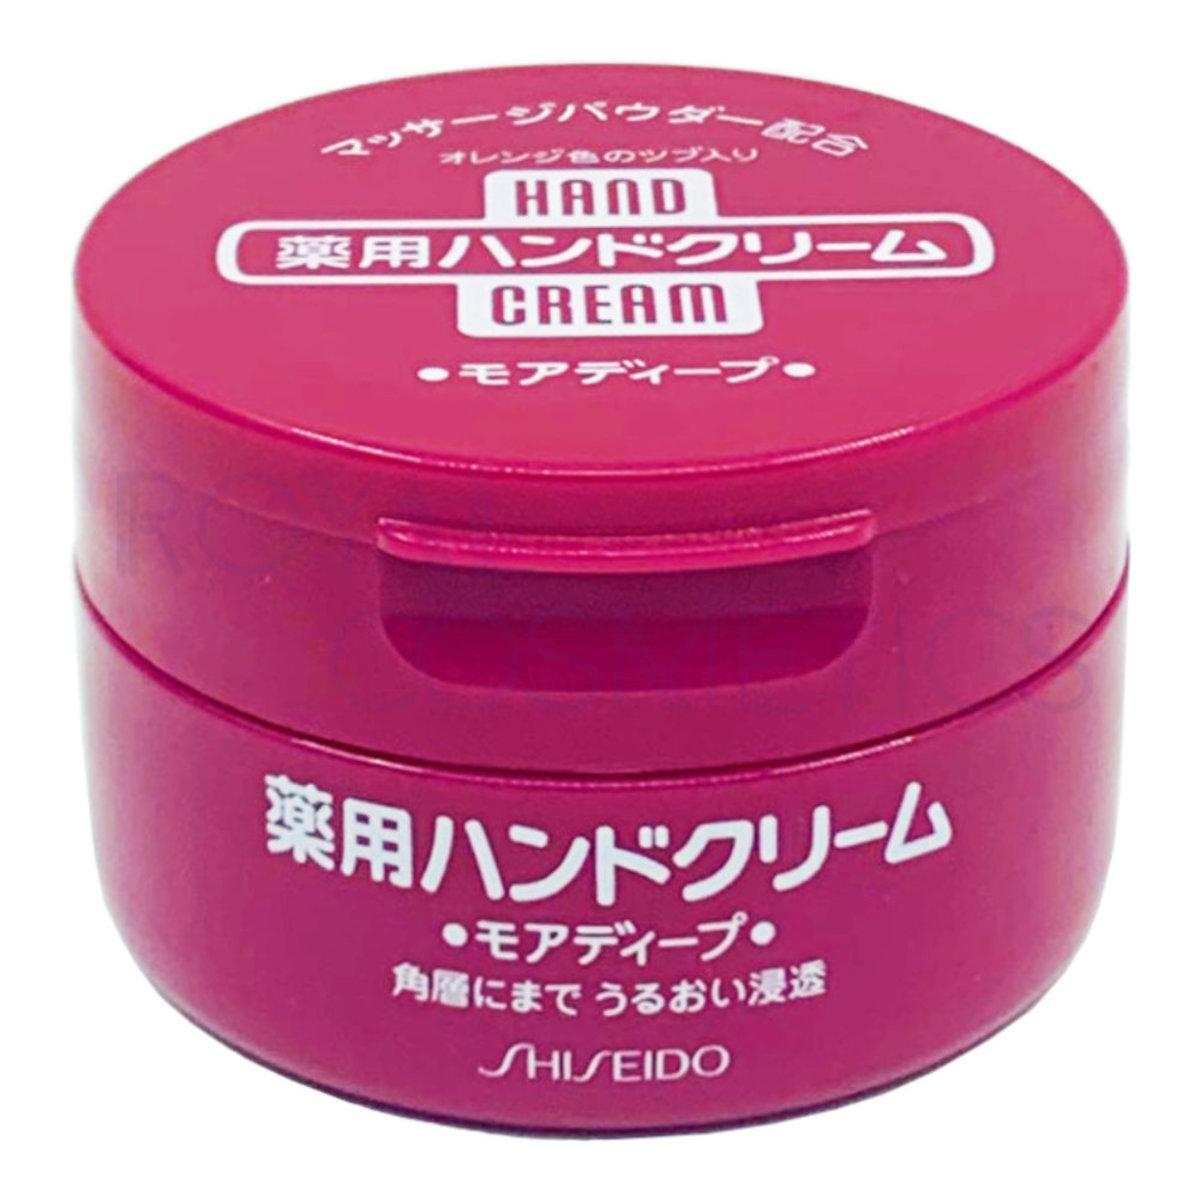 Urea Medicinal Moist Hand Cream 100g [Parallel Import] (49325263)